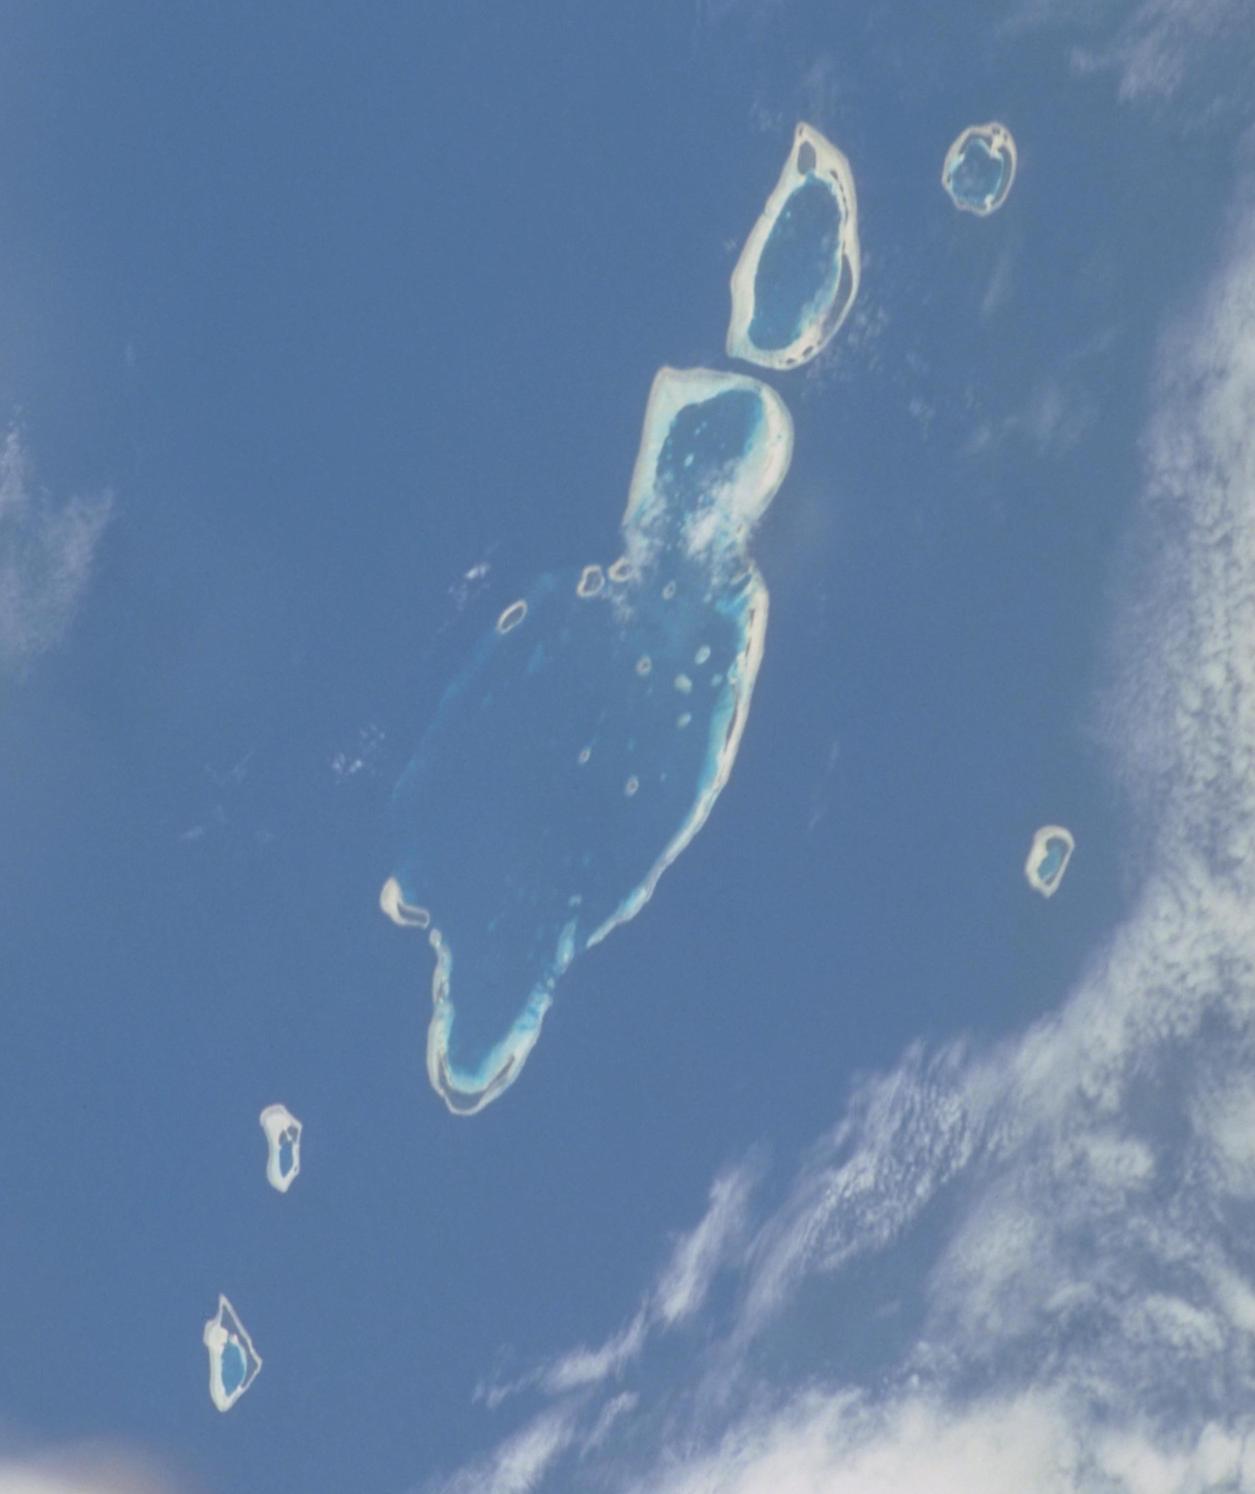 manus island nasa - photo #18